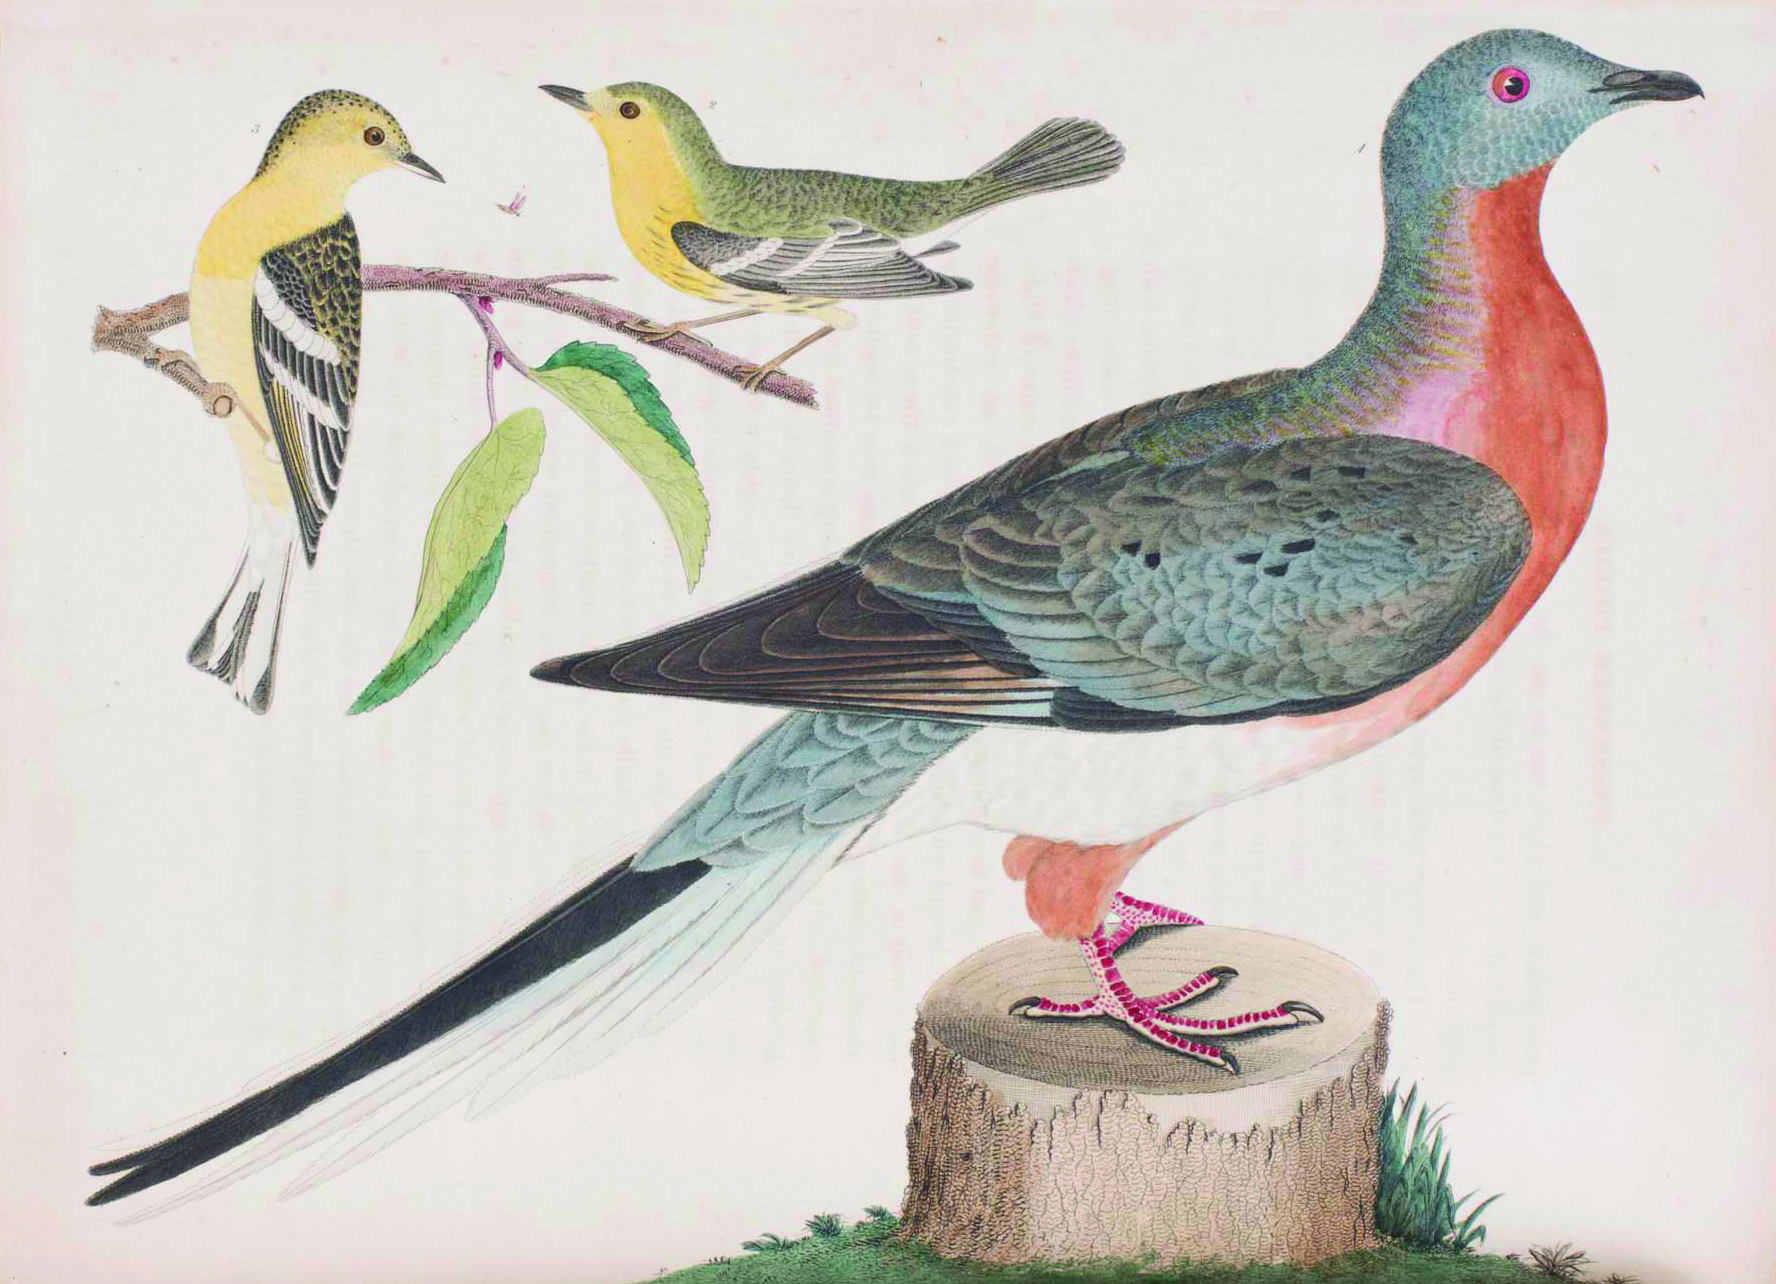 Blackburnian Warbler, from American Ornithology